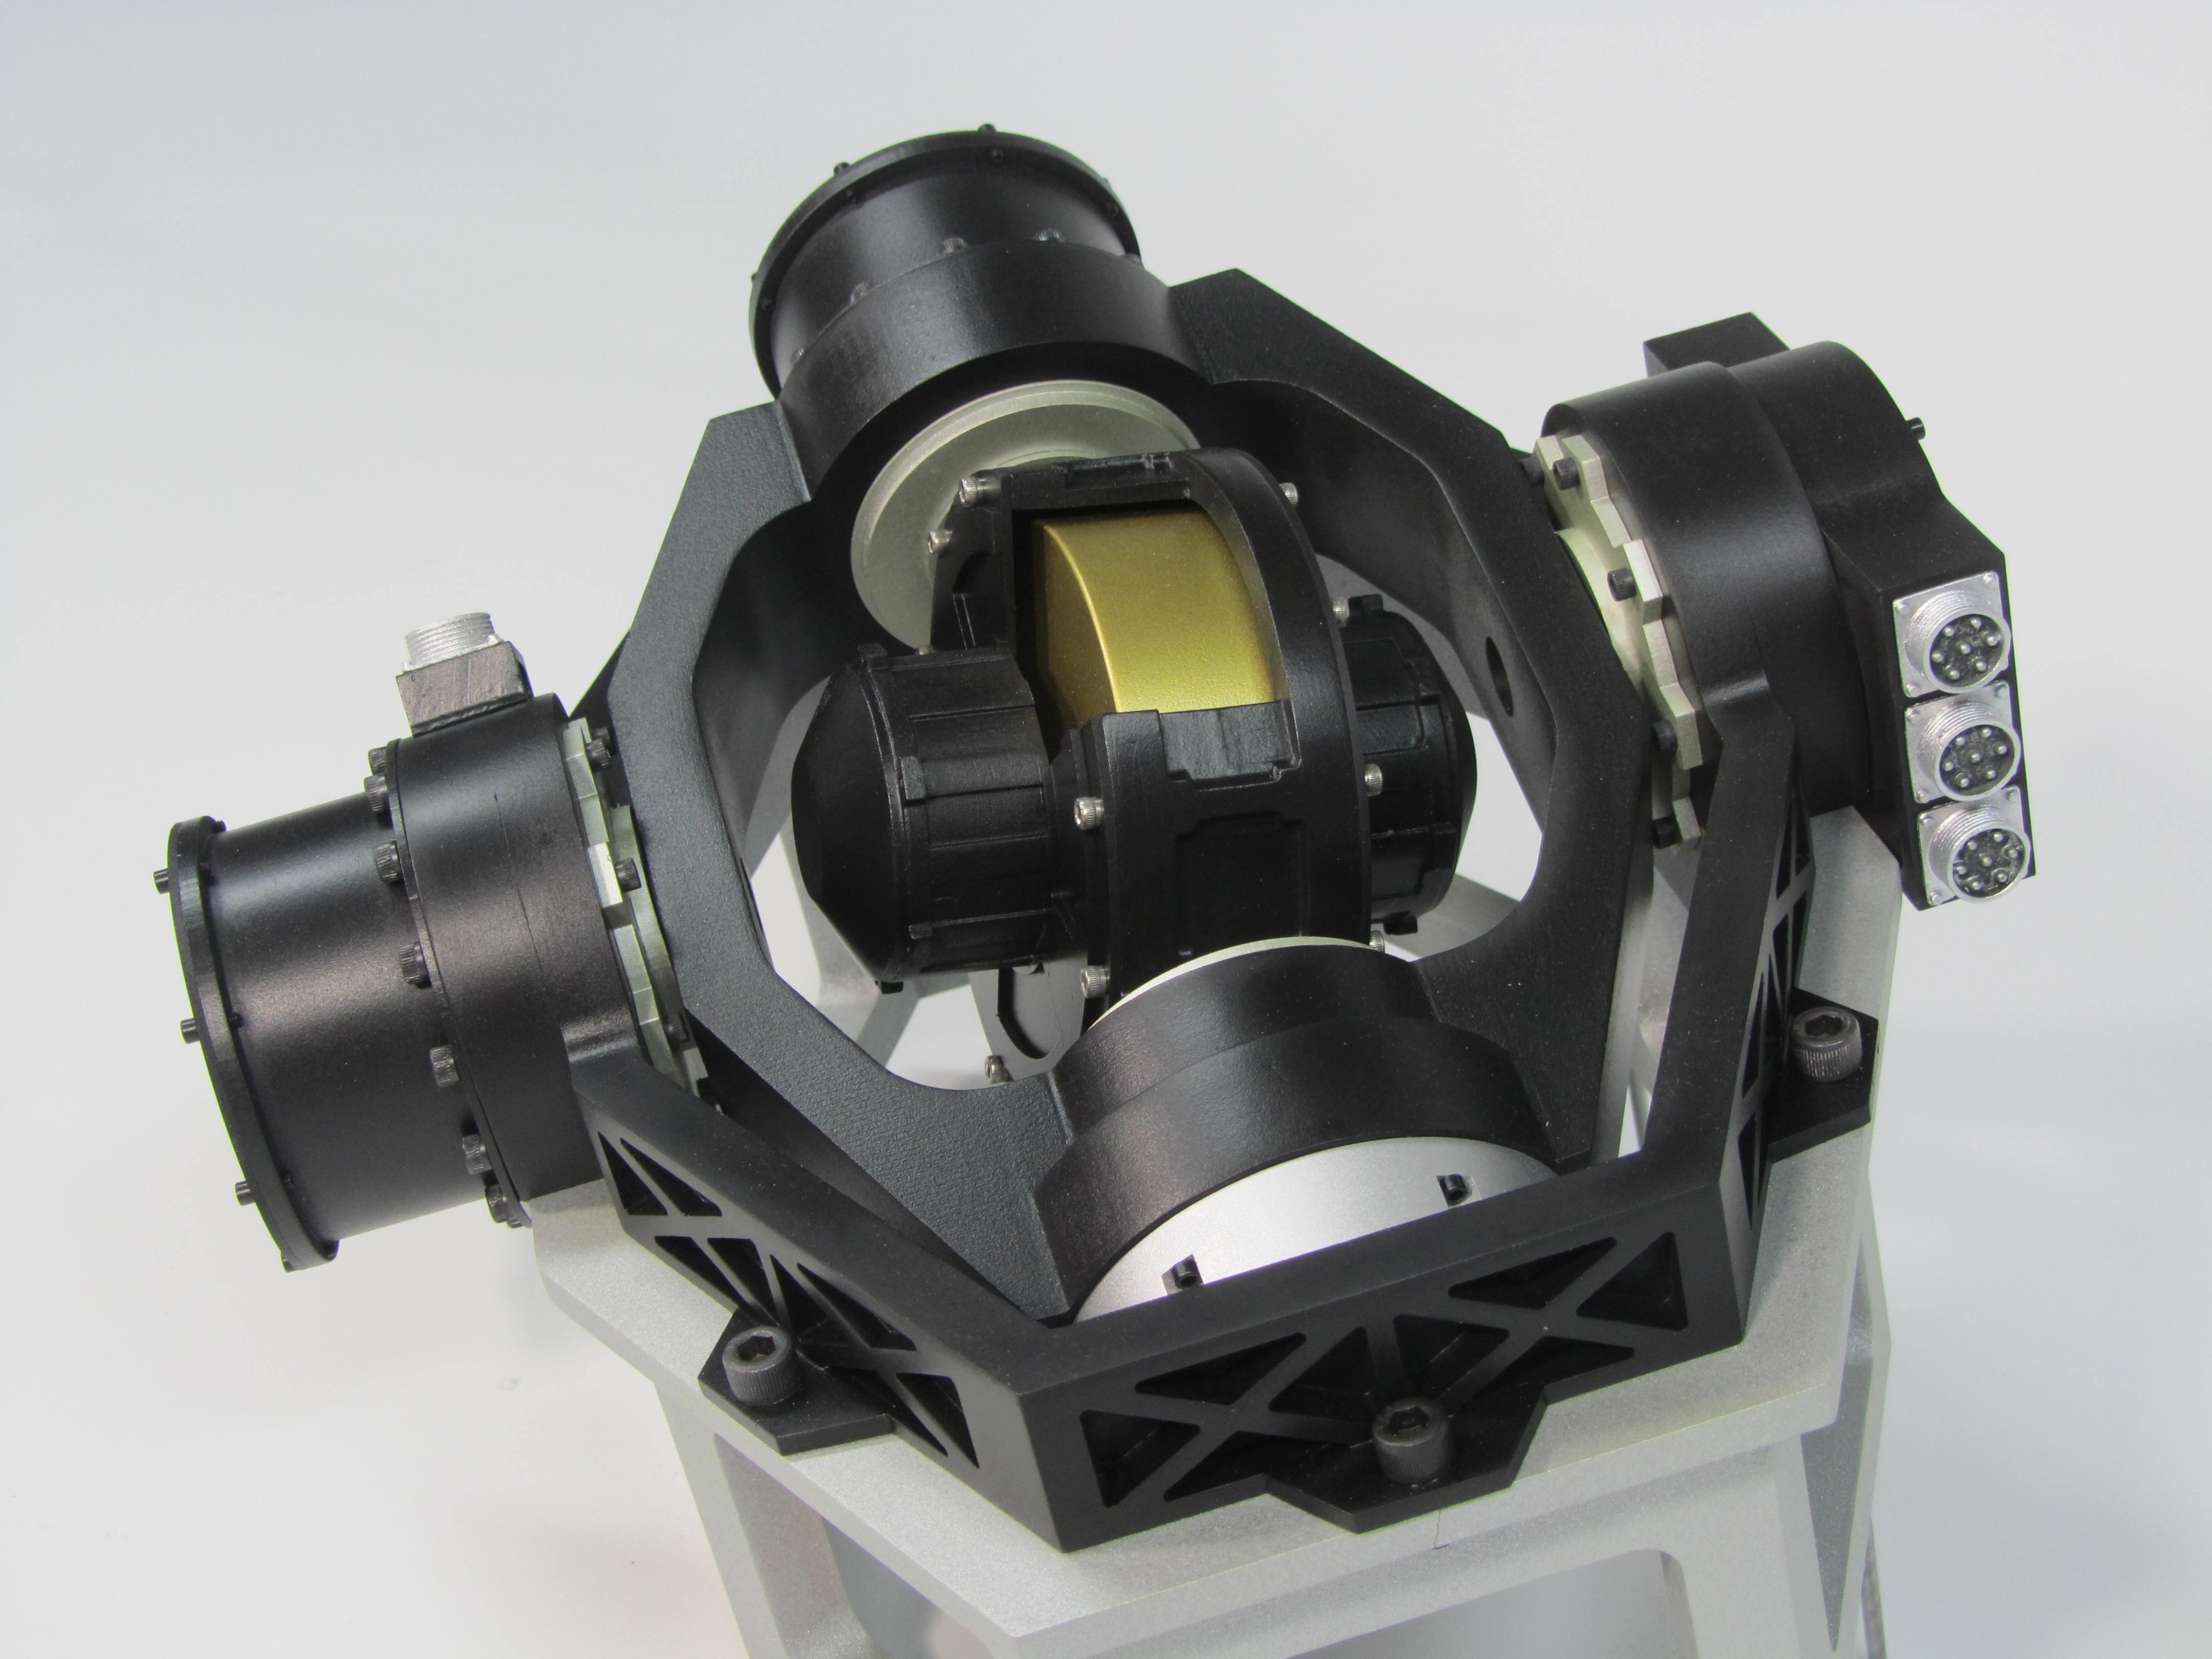 gyroscope model